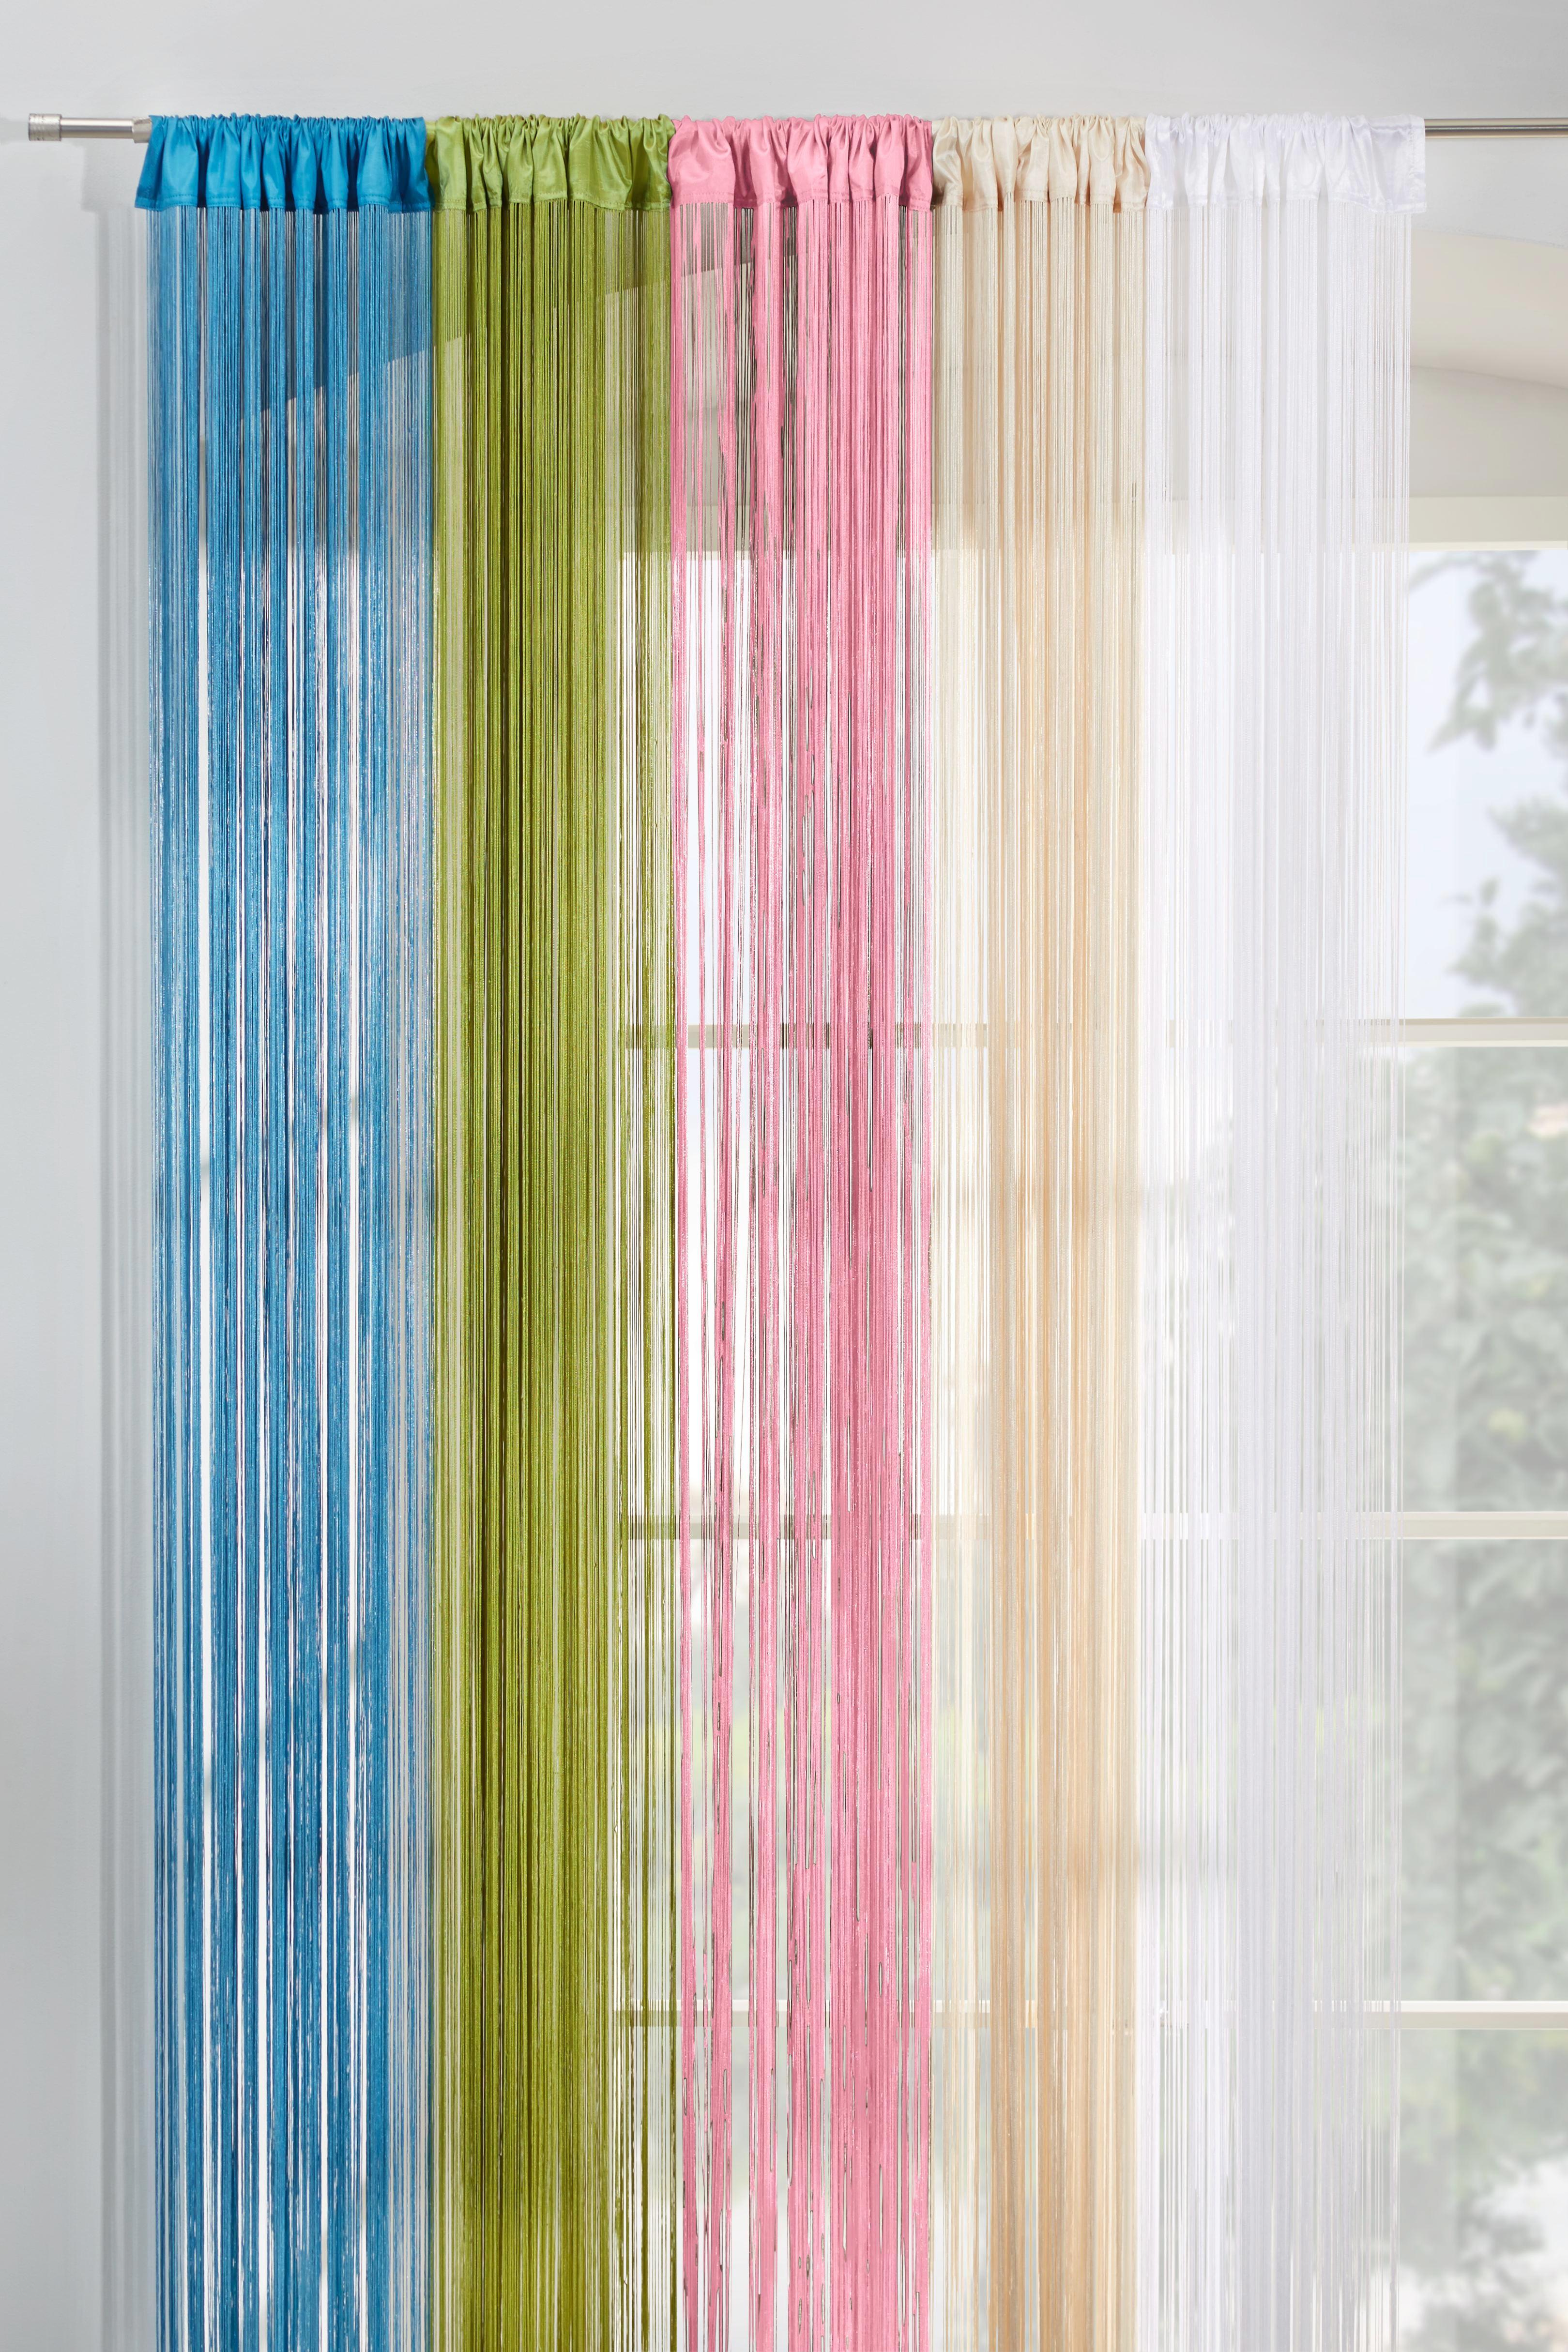 Zsinórfüggöny Victoria - krém, textil (90/245cm) - MÖMAX modern living